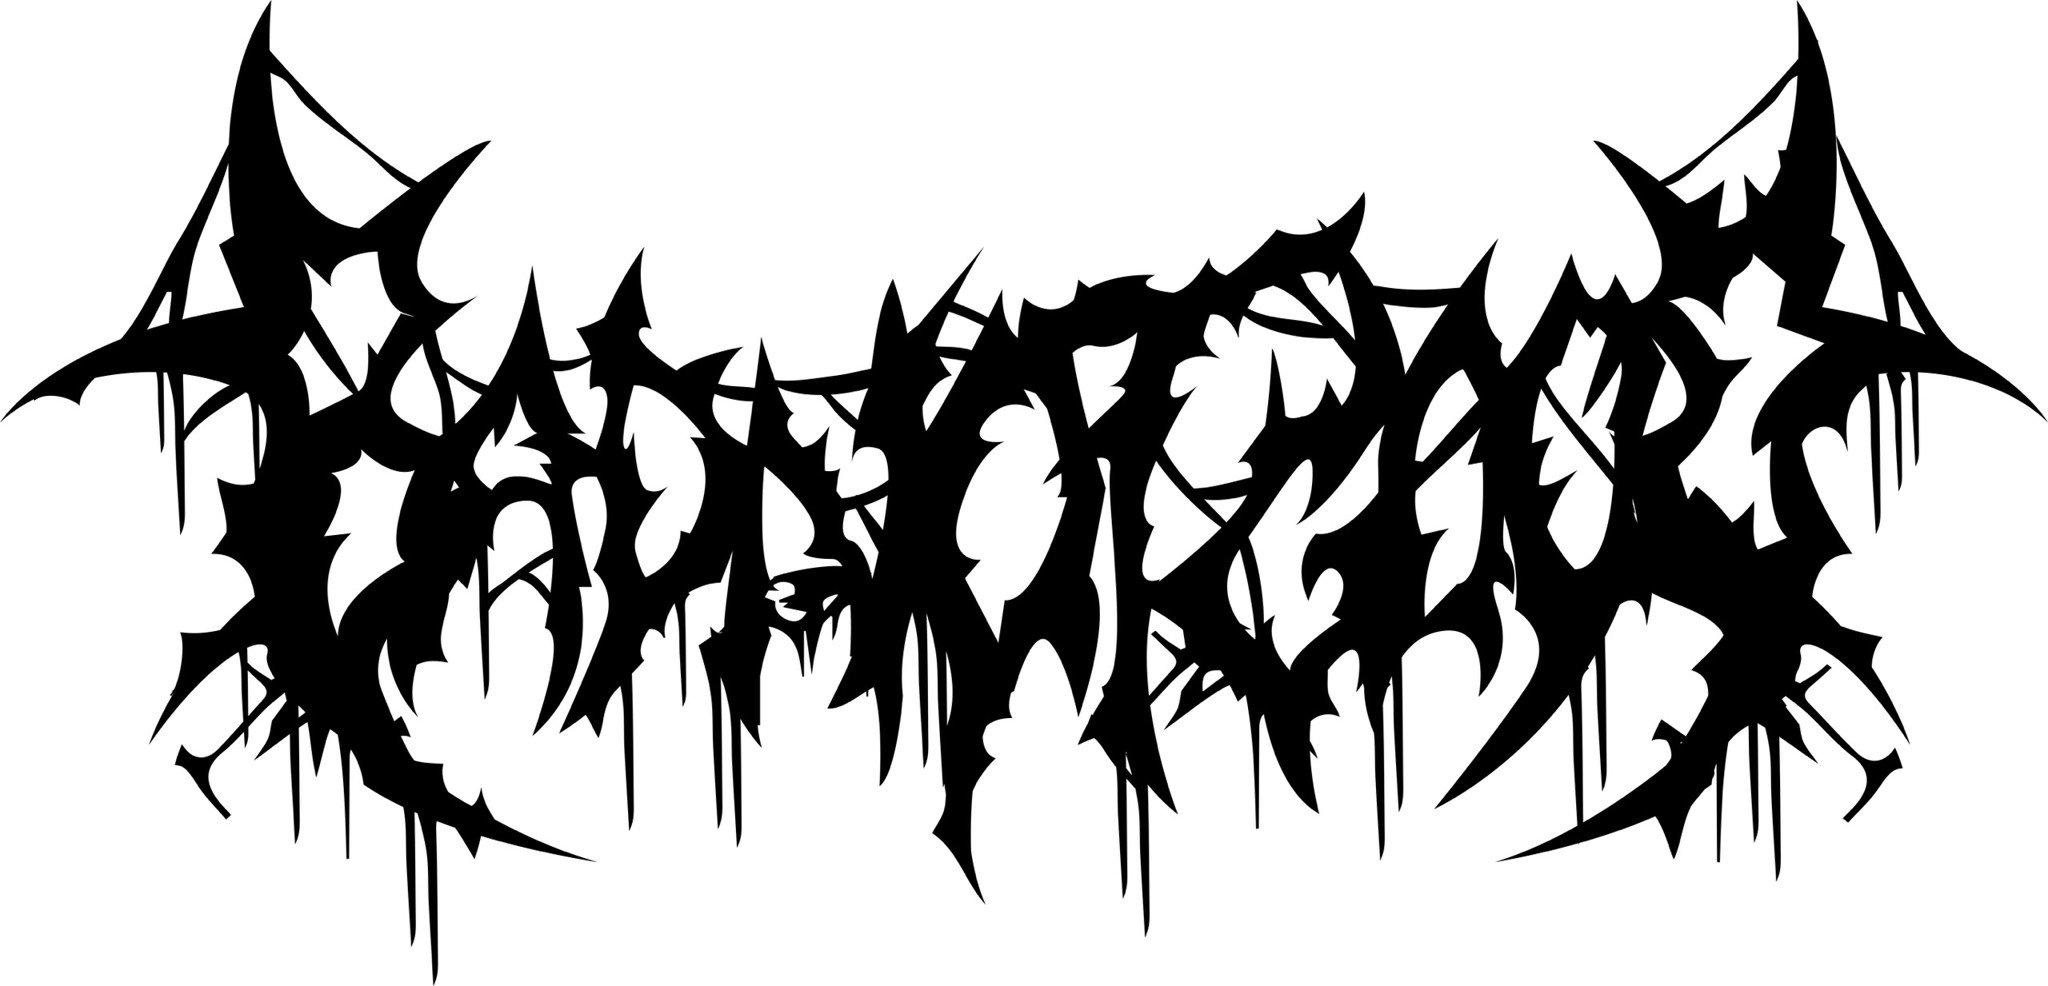 BADNOTGOOD